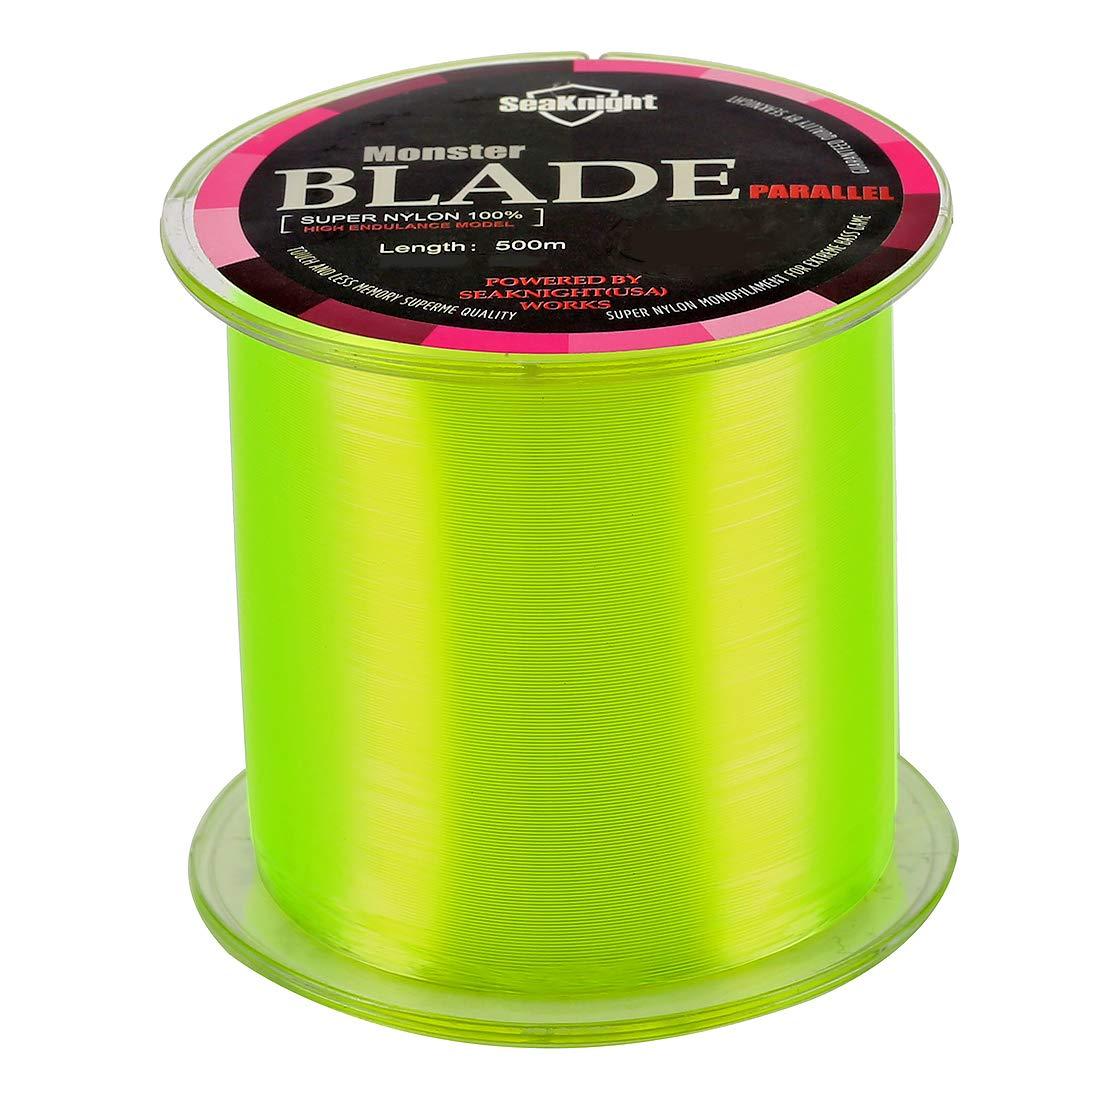 SeaKnight Blade Nylon Linea de Pesca 500 m 547yds Japan Material Monofilamento Carpa Linea de Pesca sedal 2-35LB